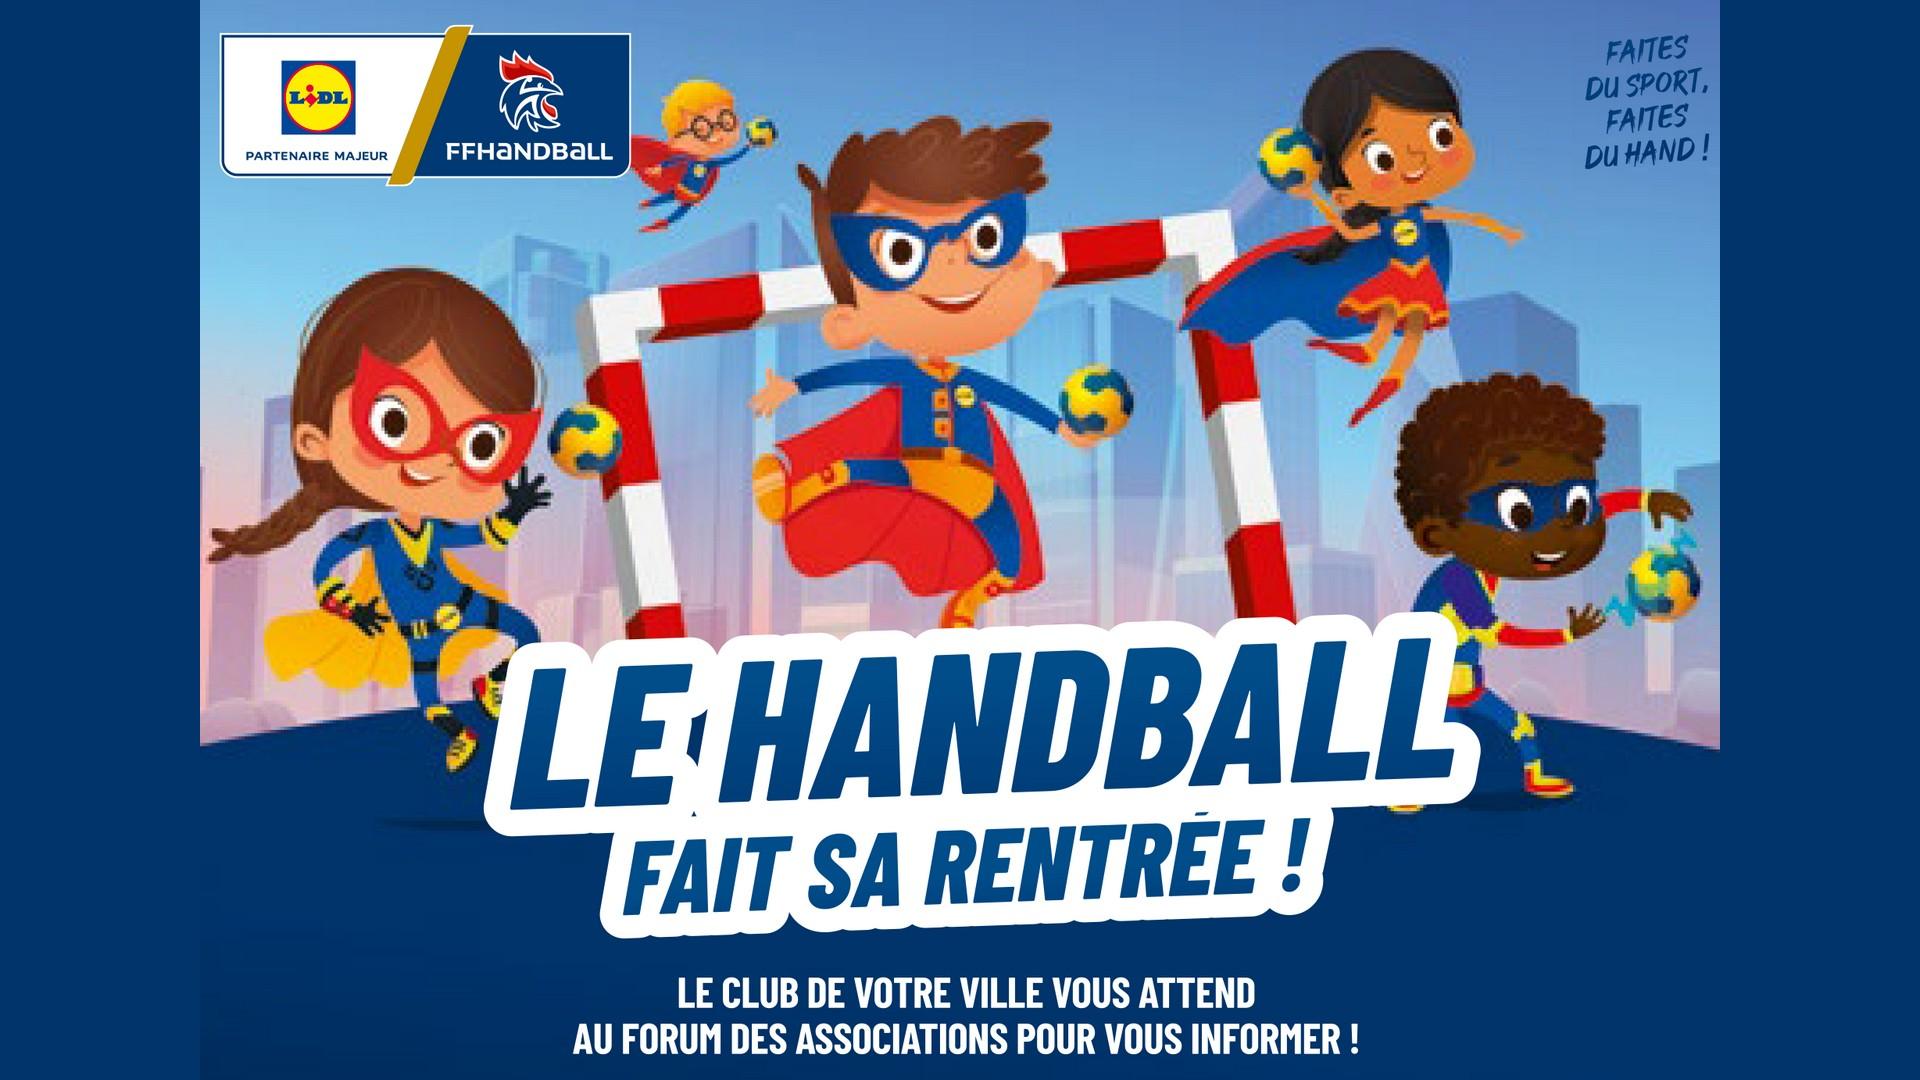 Lidl x Handball campagne clubs 2021